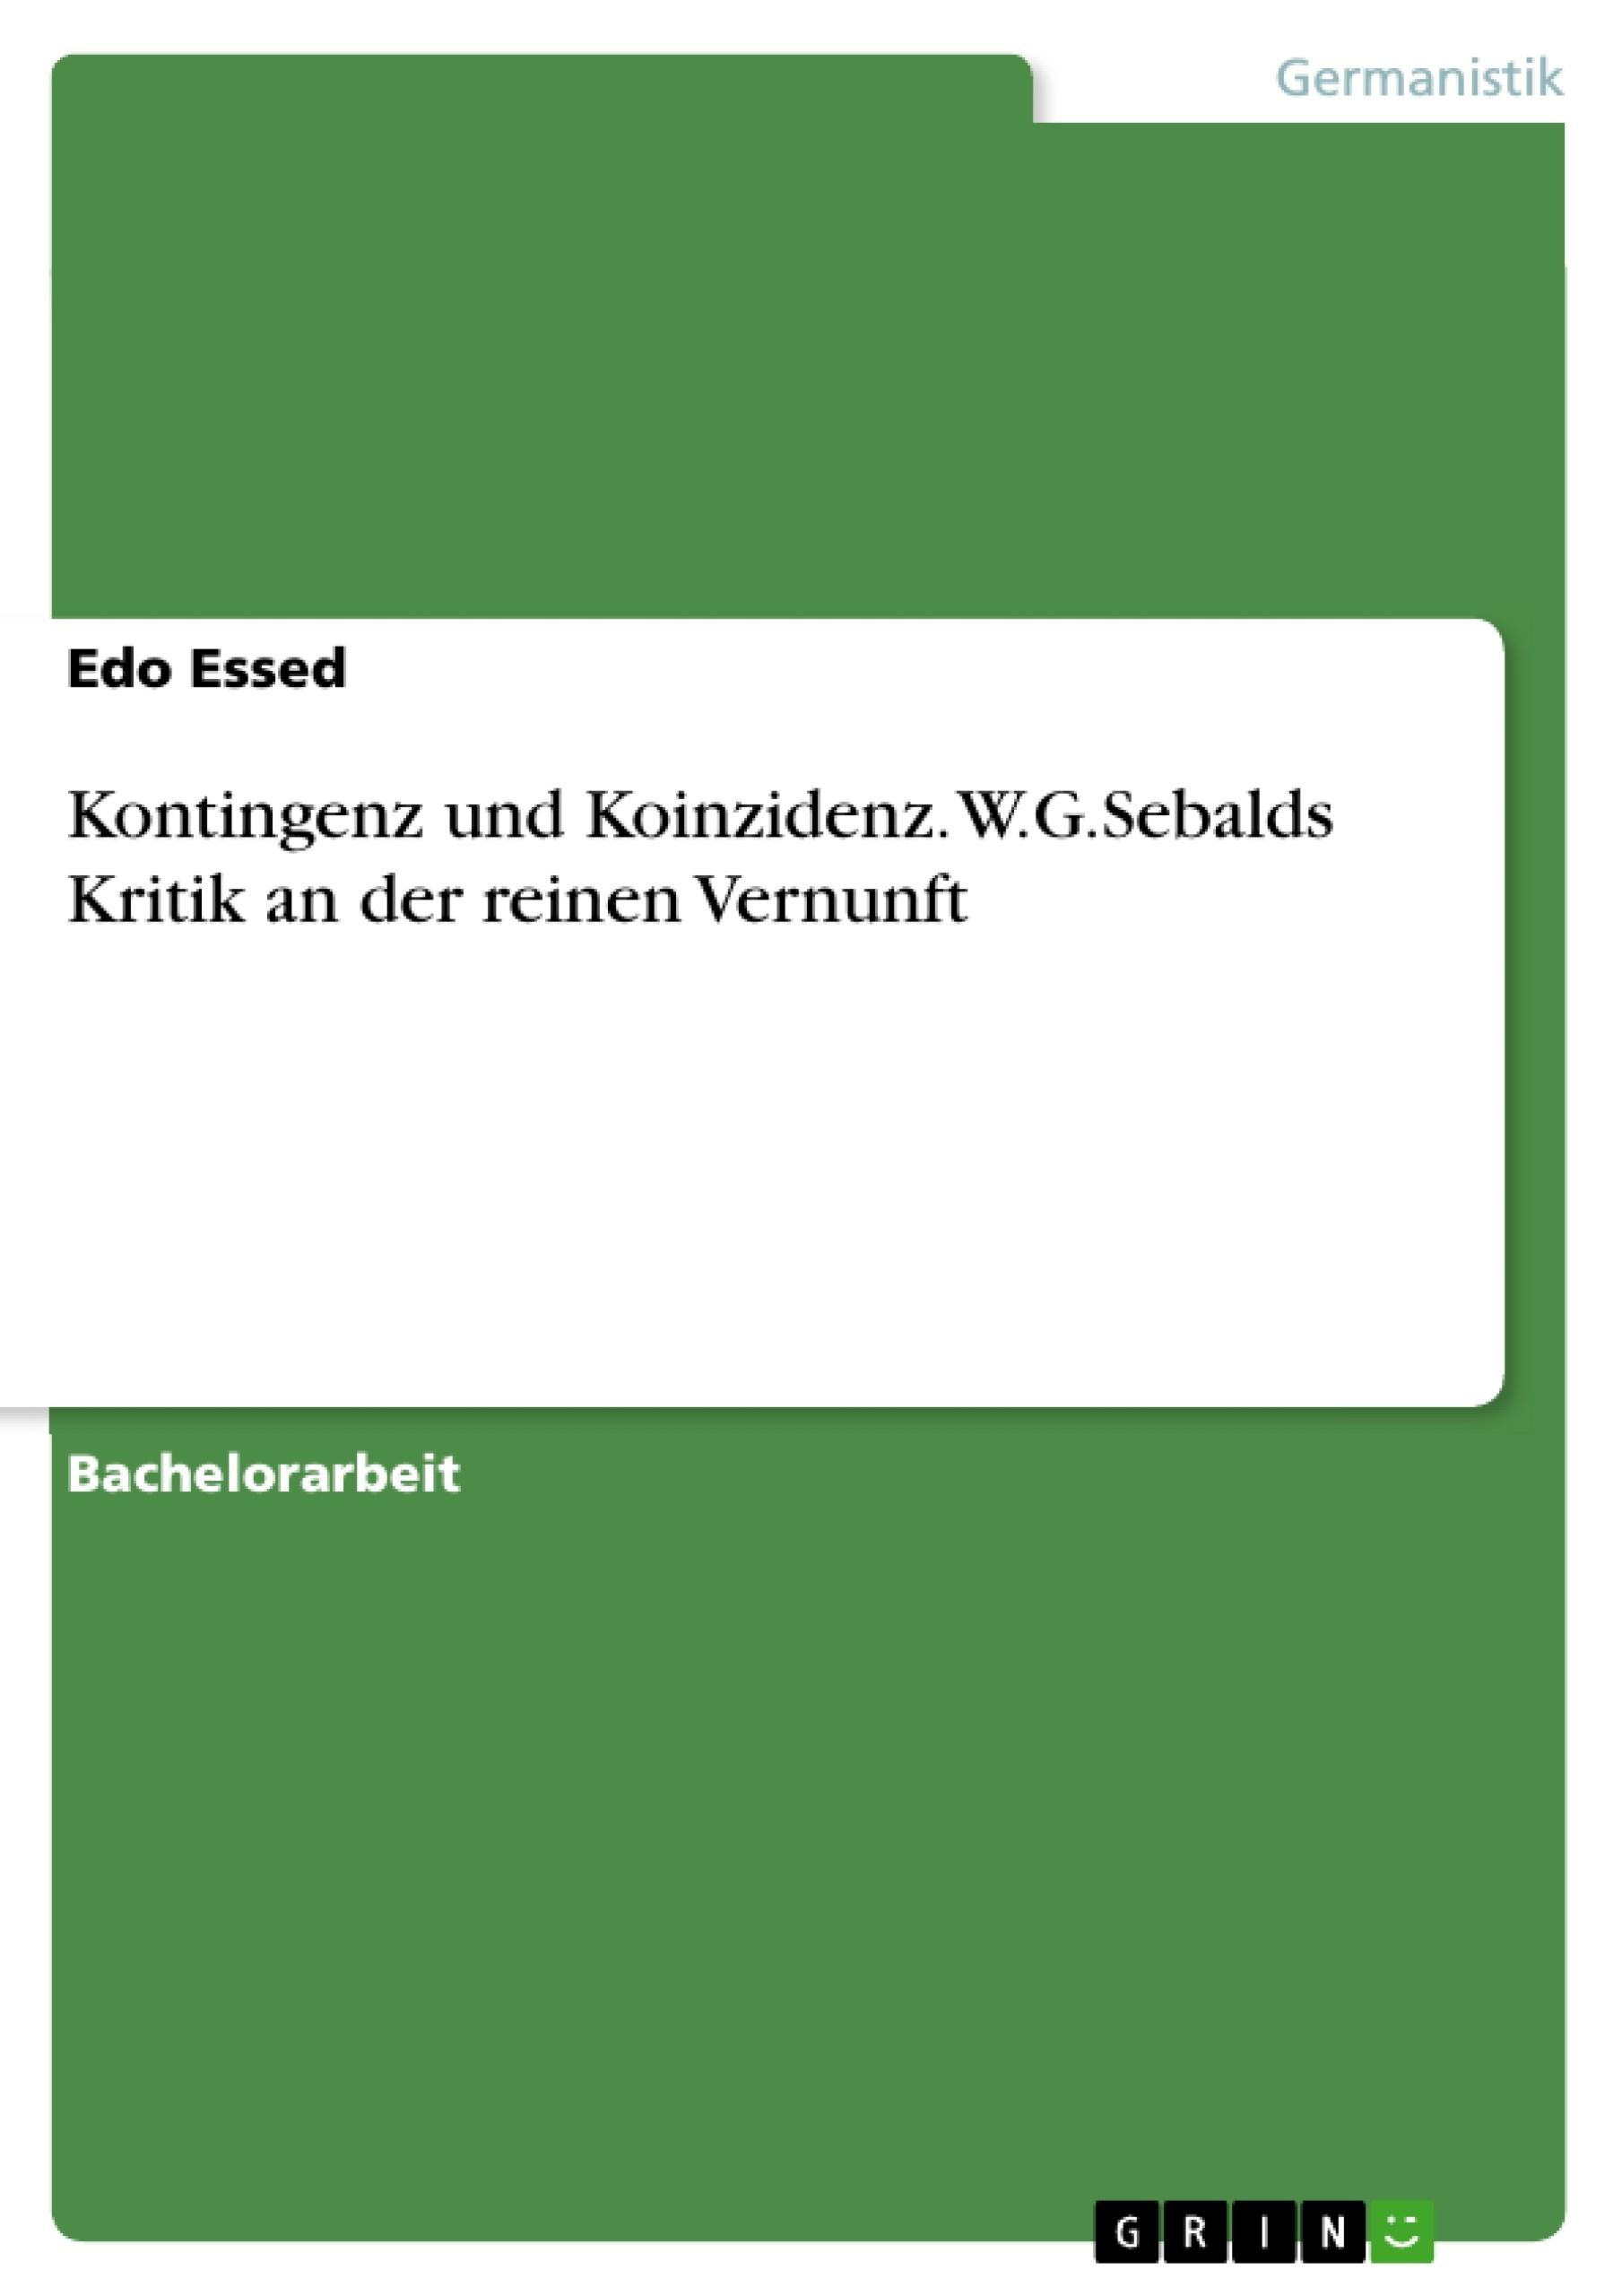 Titel: Kontingenz und Koinzidenz. W.G.Sebalds Kritik an der reinen Vernunft